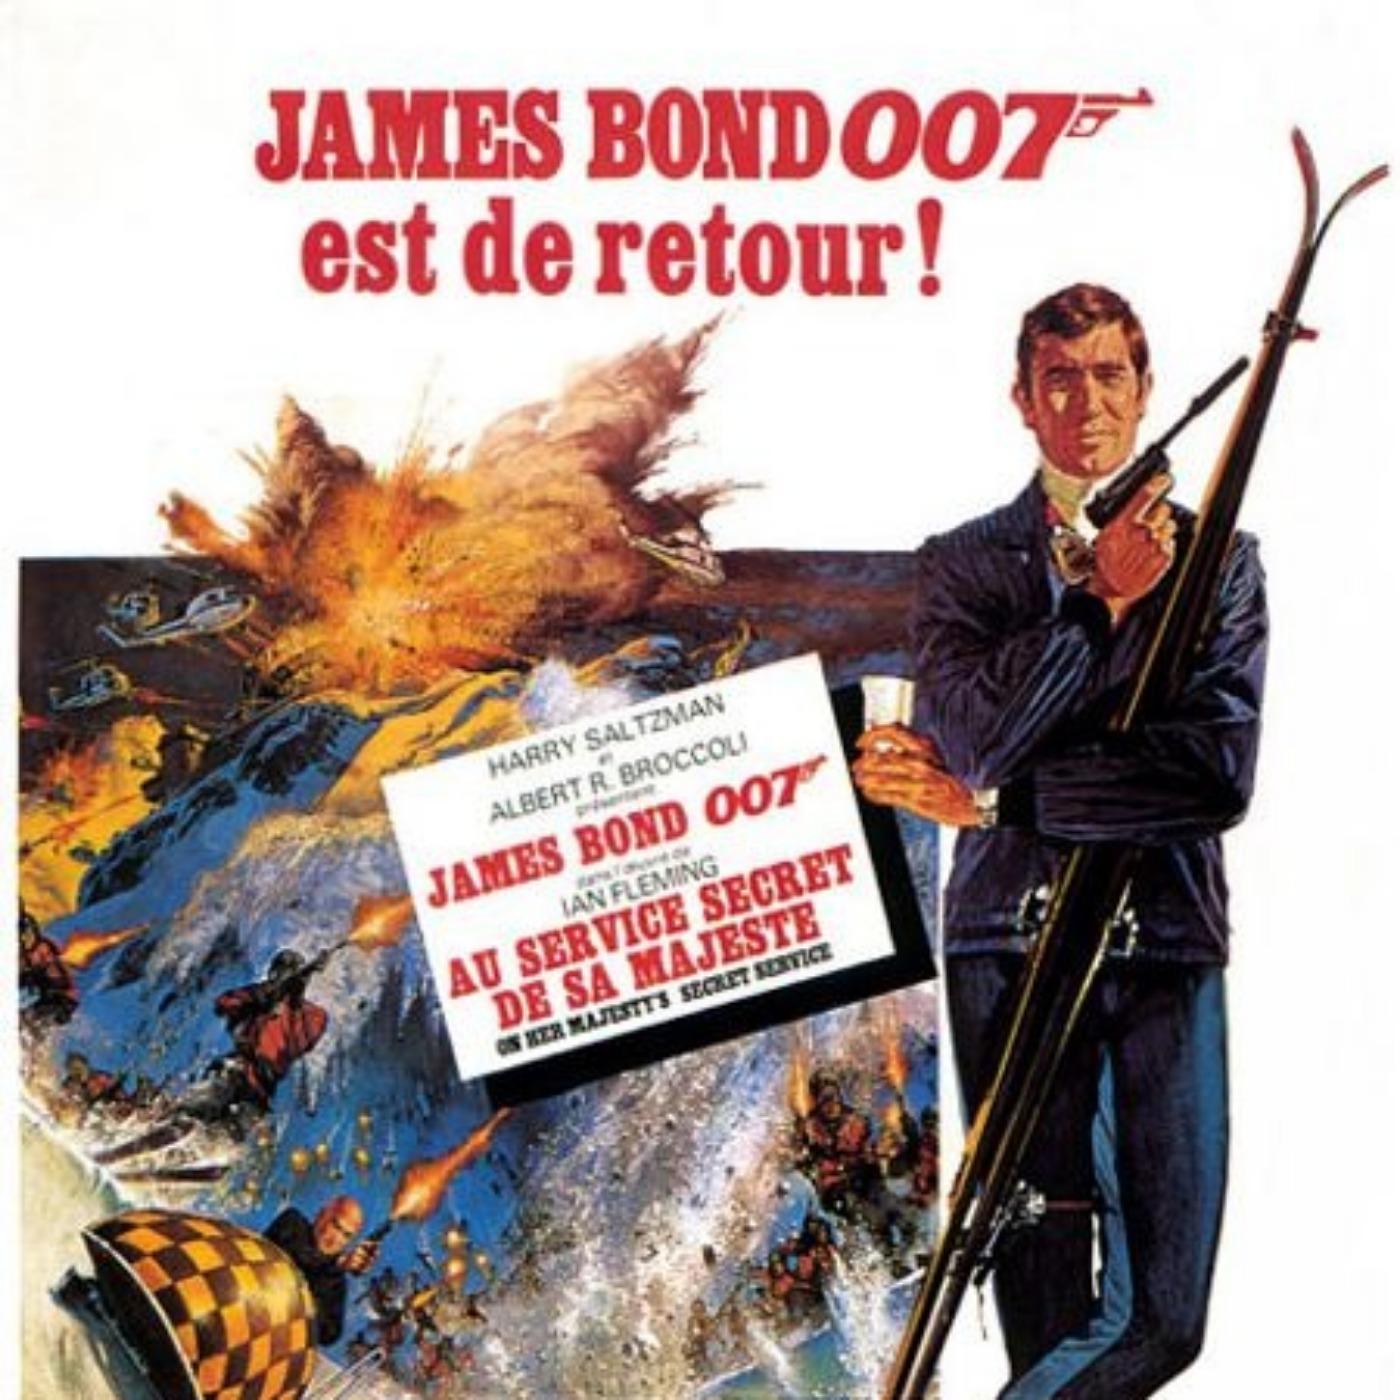 PODCAST CINEMA   critique du film AU SERVICE SECRET DE SA MAJESTE   Saga James Bond #8